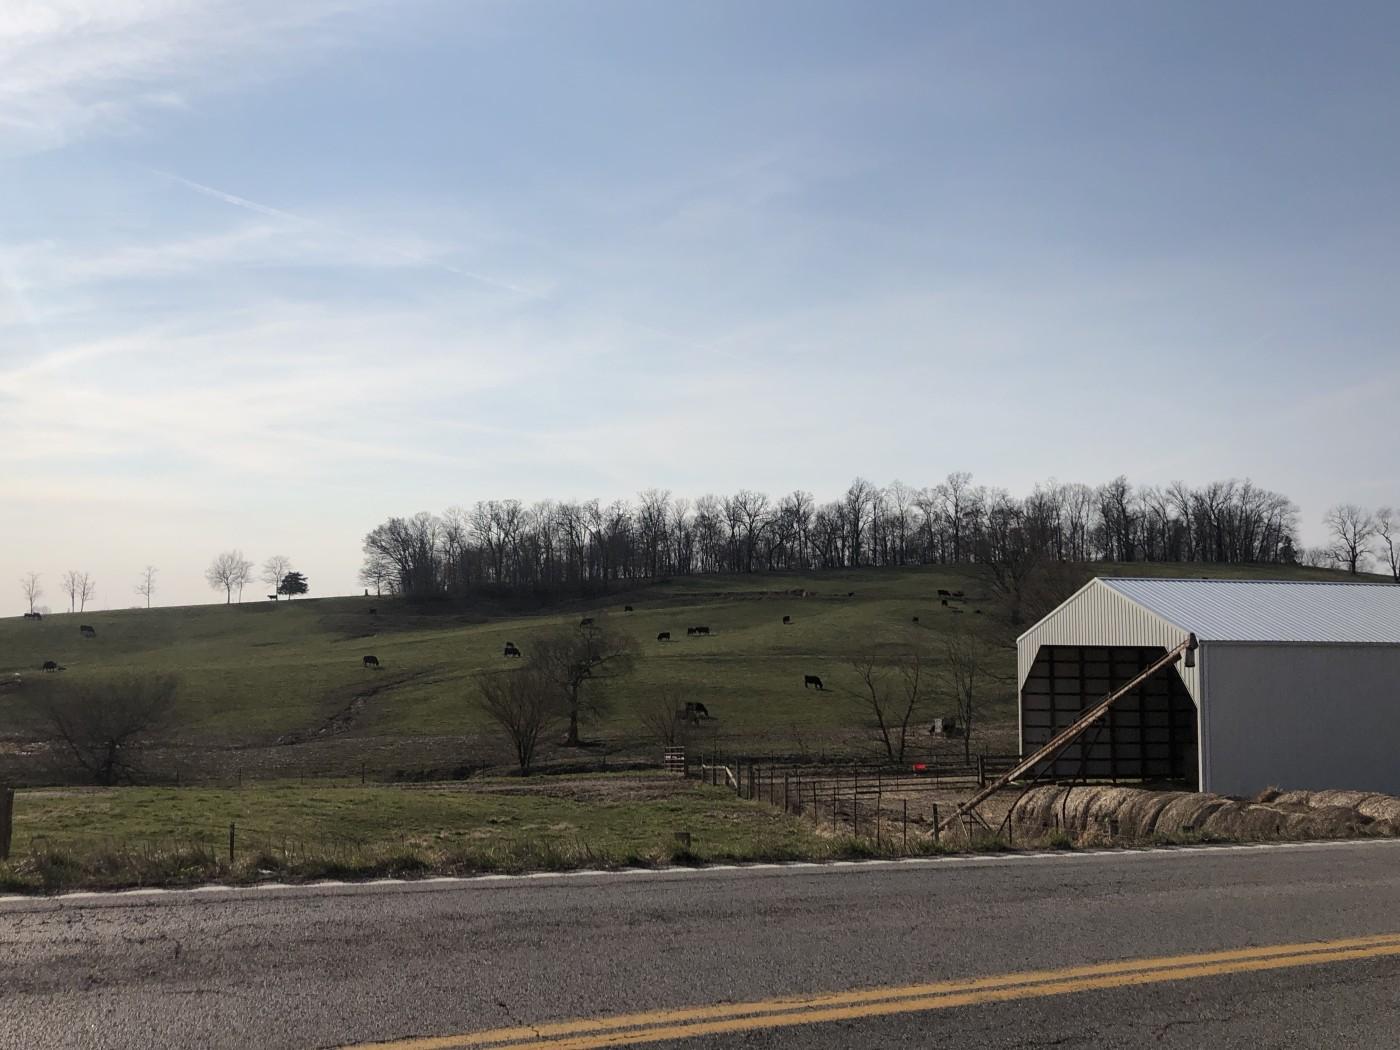 Southeaster Missouri